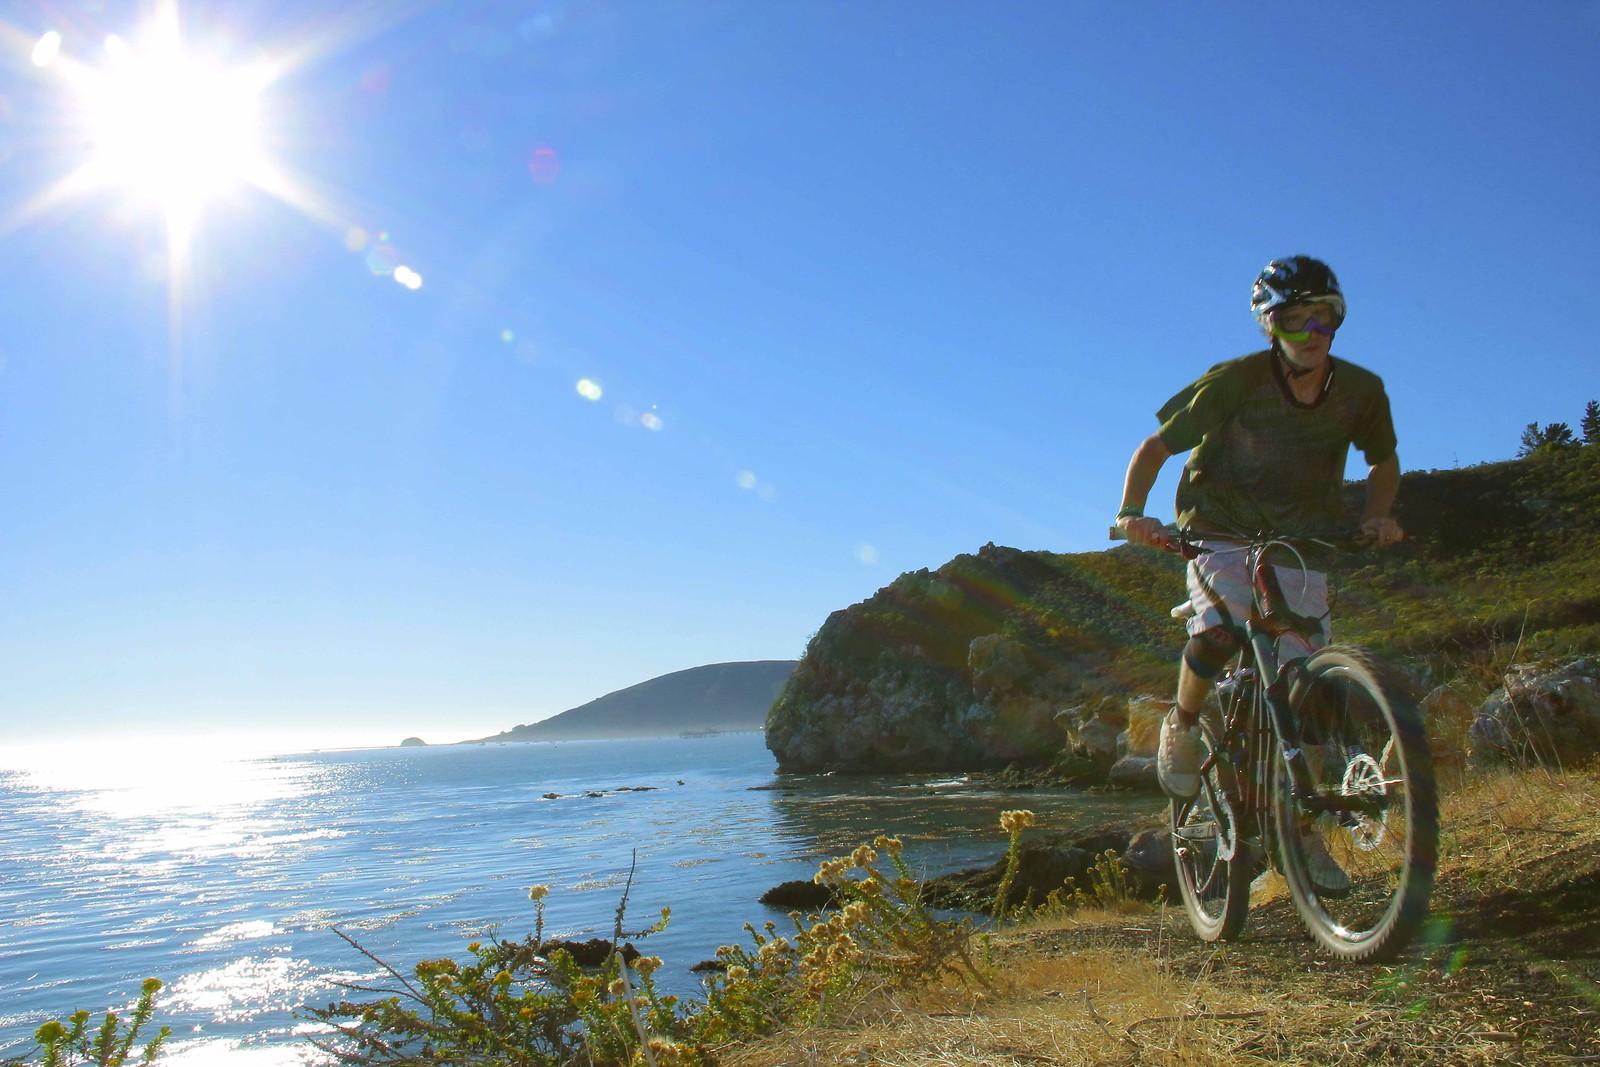 MG 2255fb - GnarHuck - Mountain Biking Pictures - Vital MTB